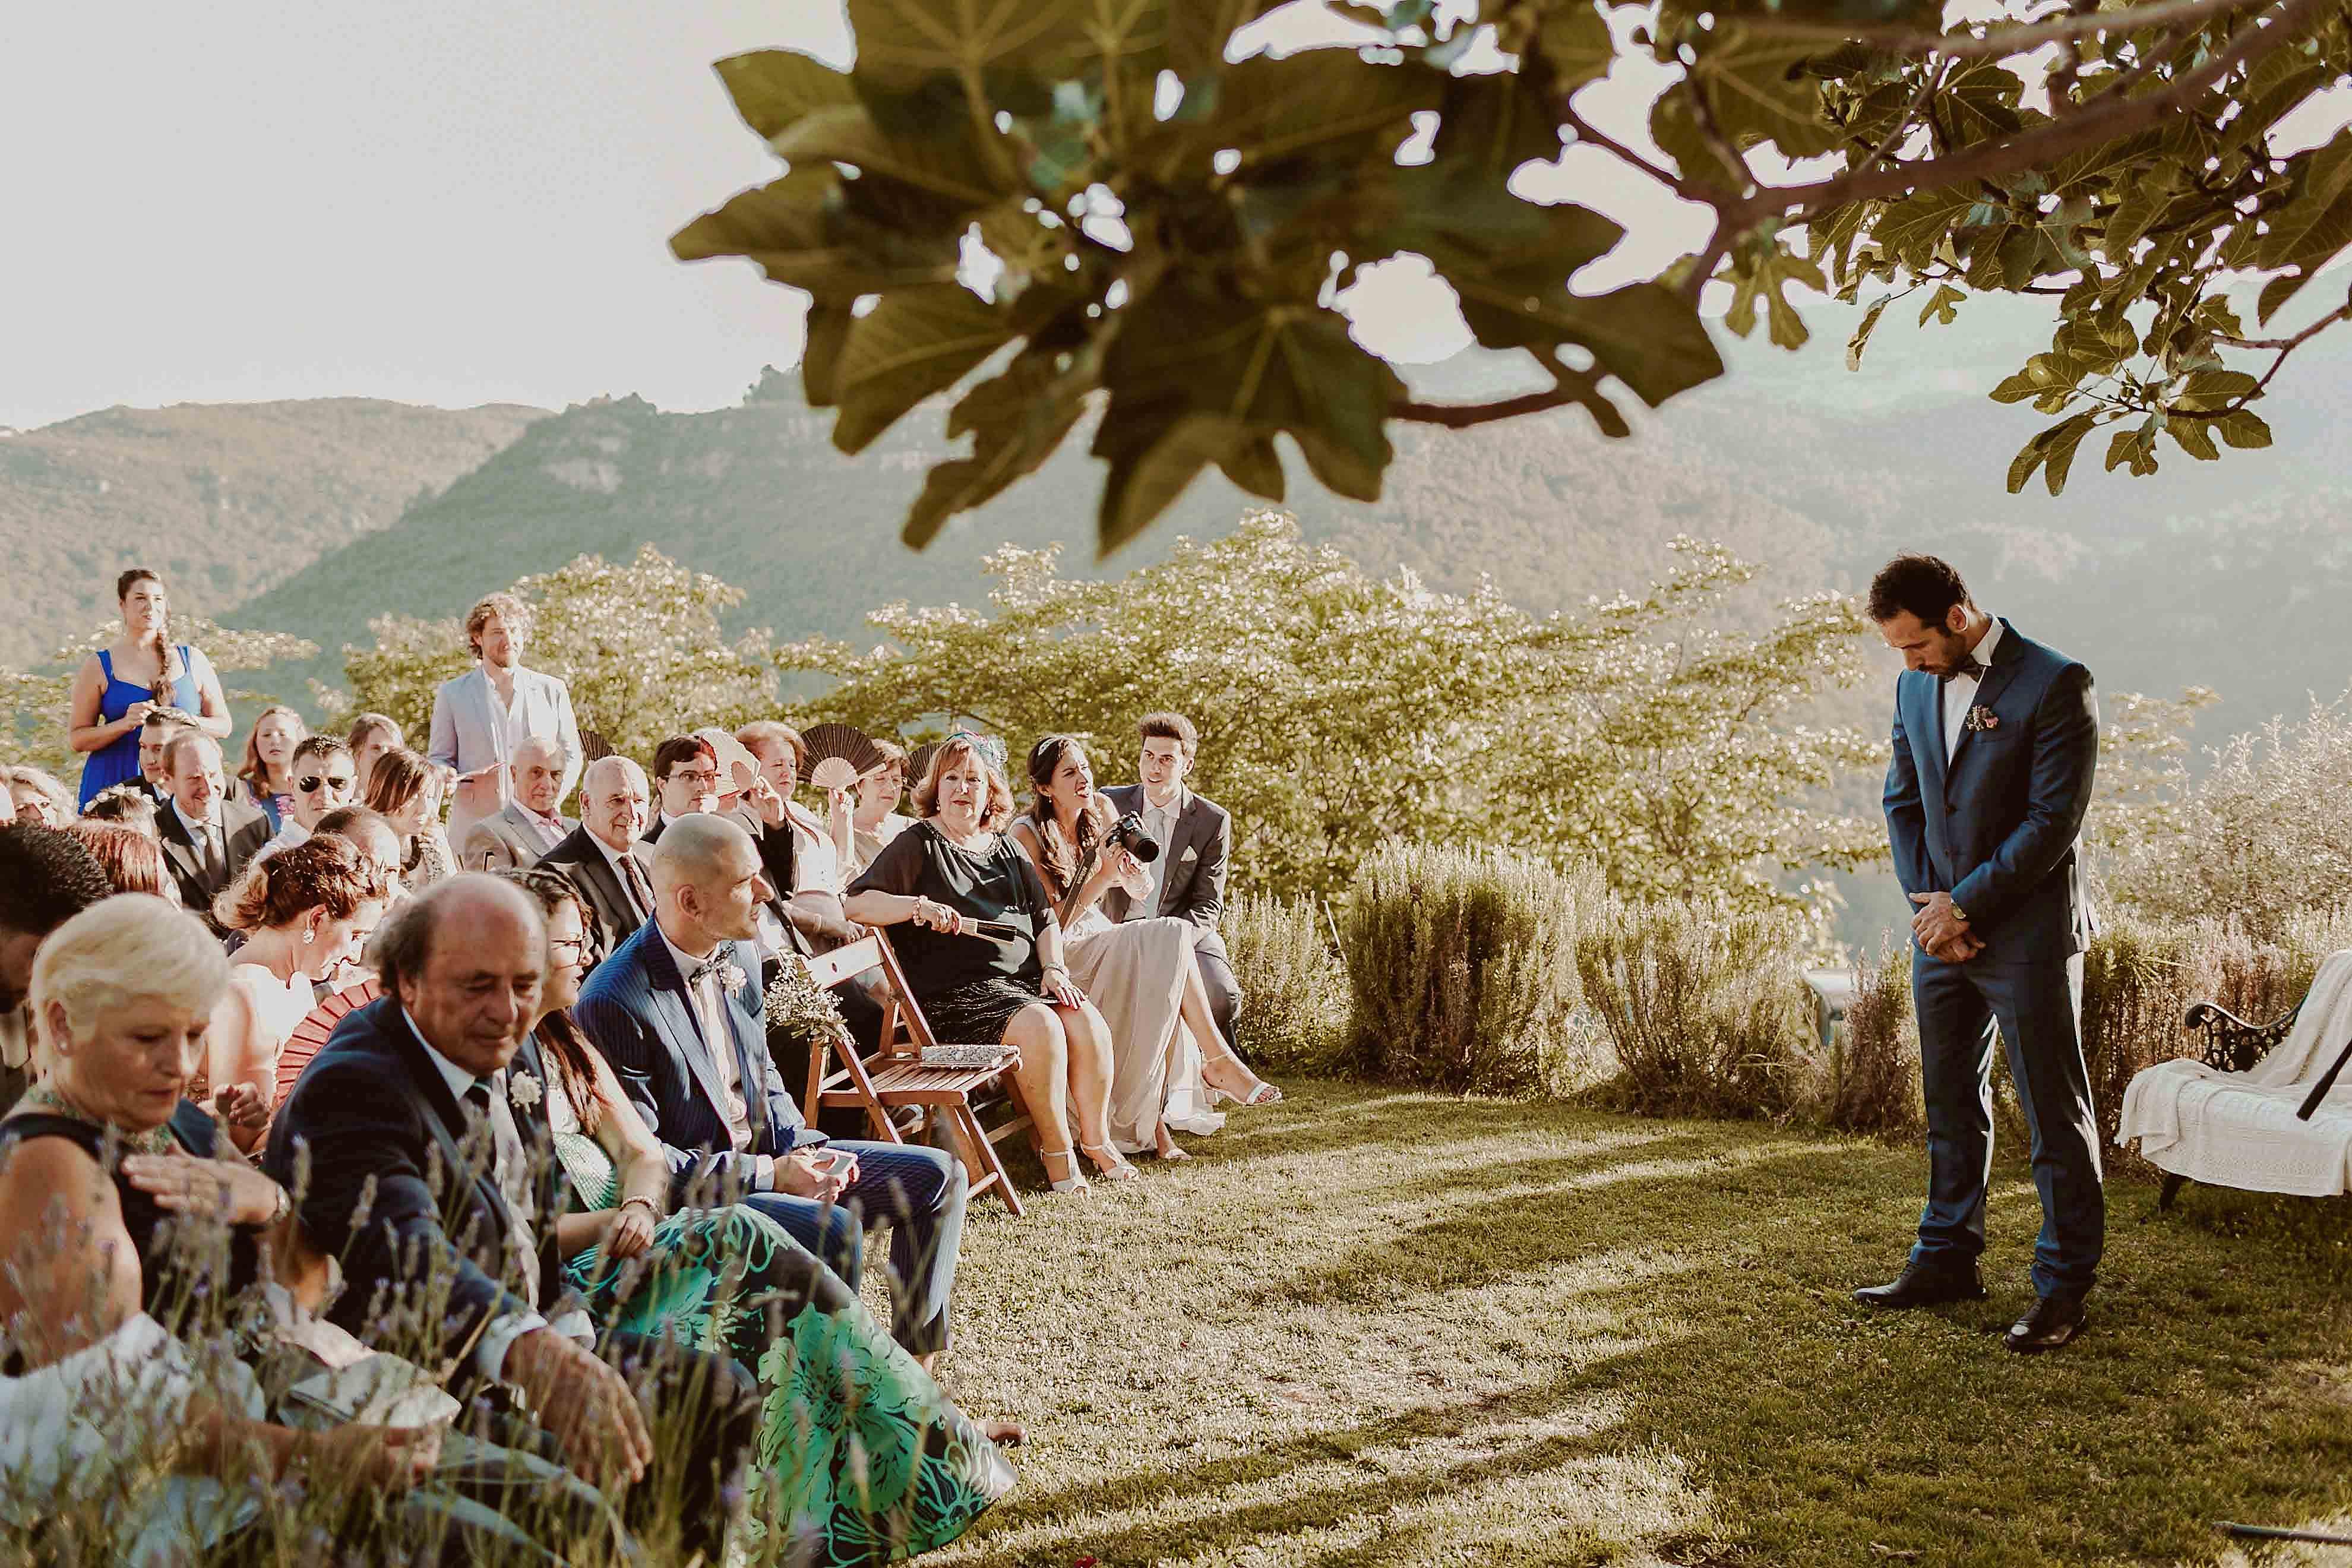 Boda rústica en la montaña. fotgrafo de bodas barcelona_048